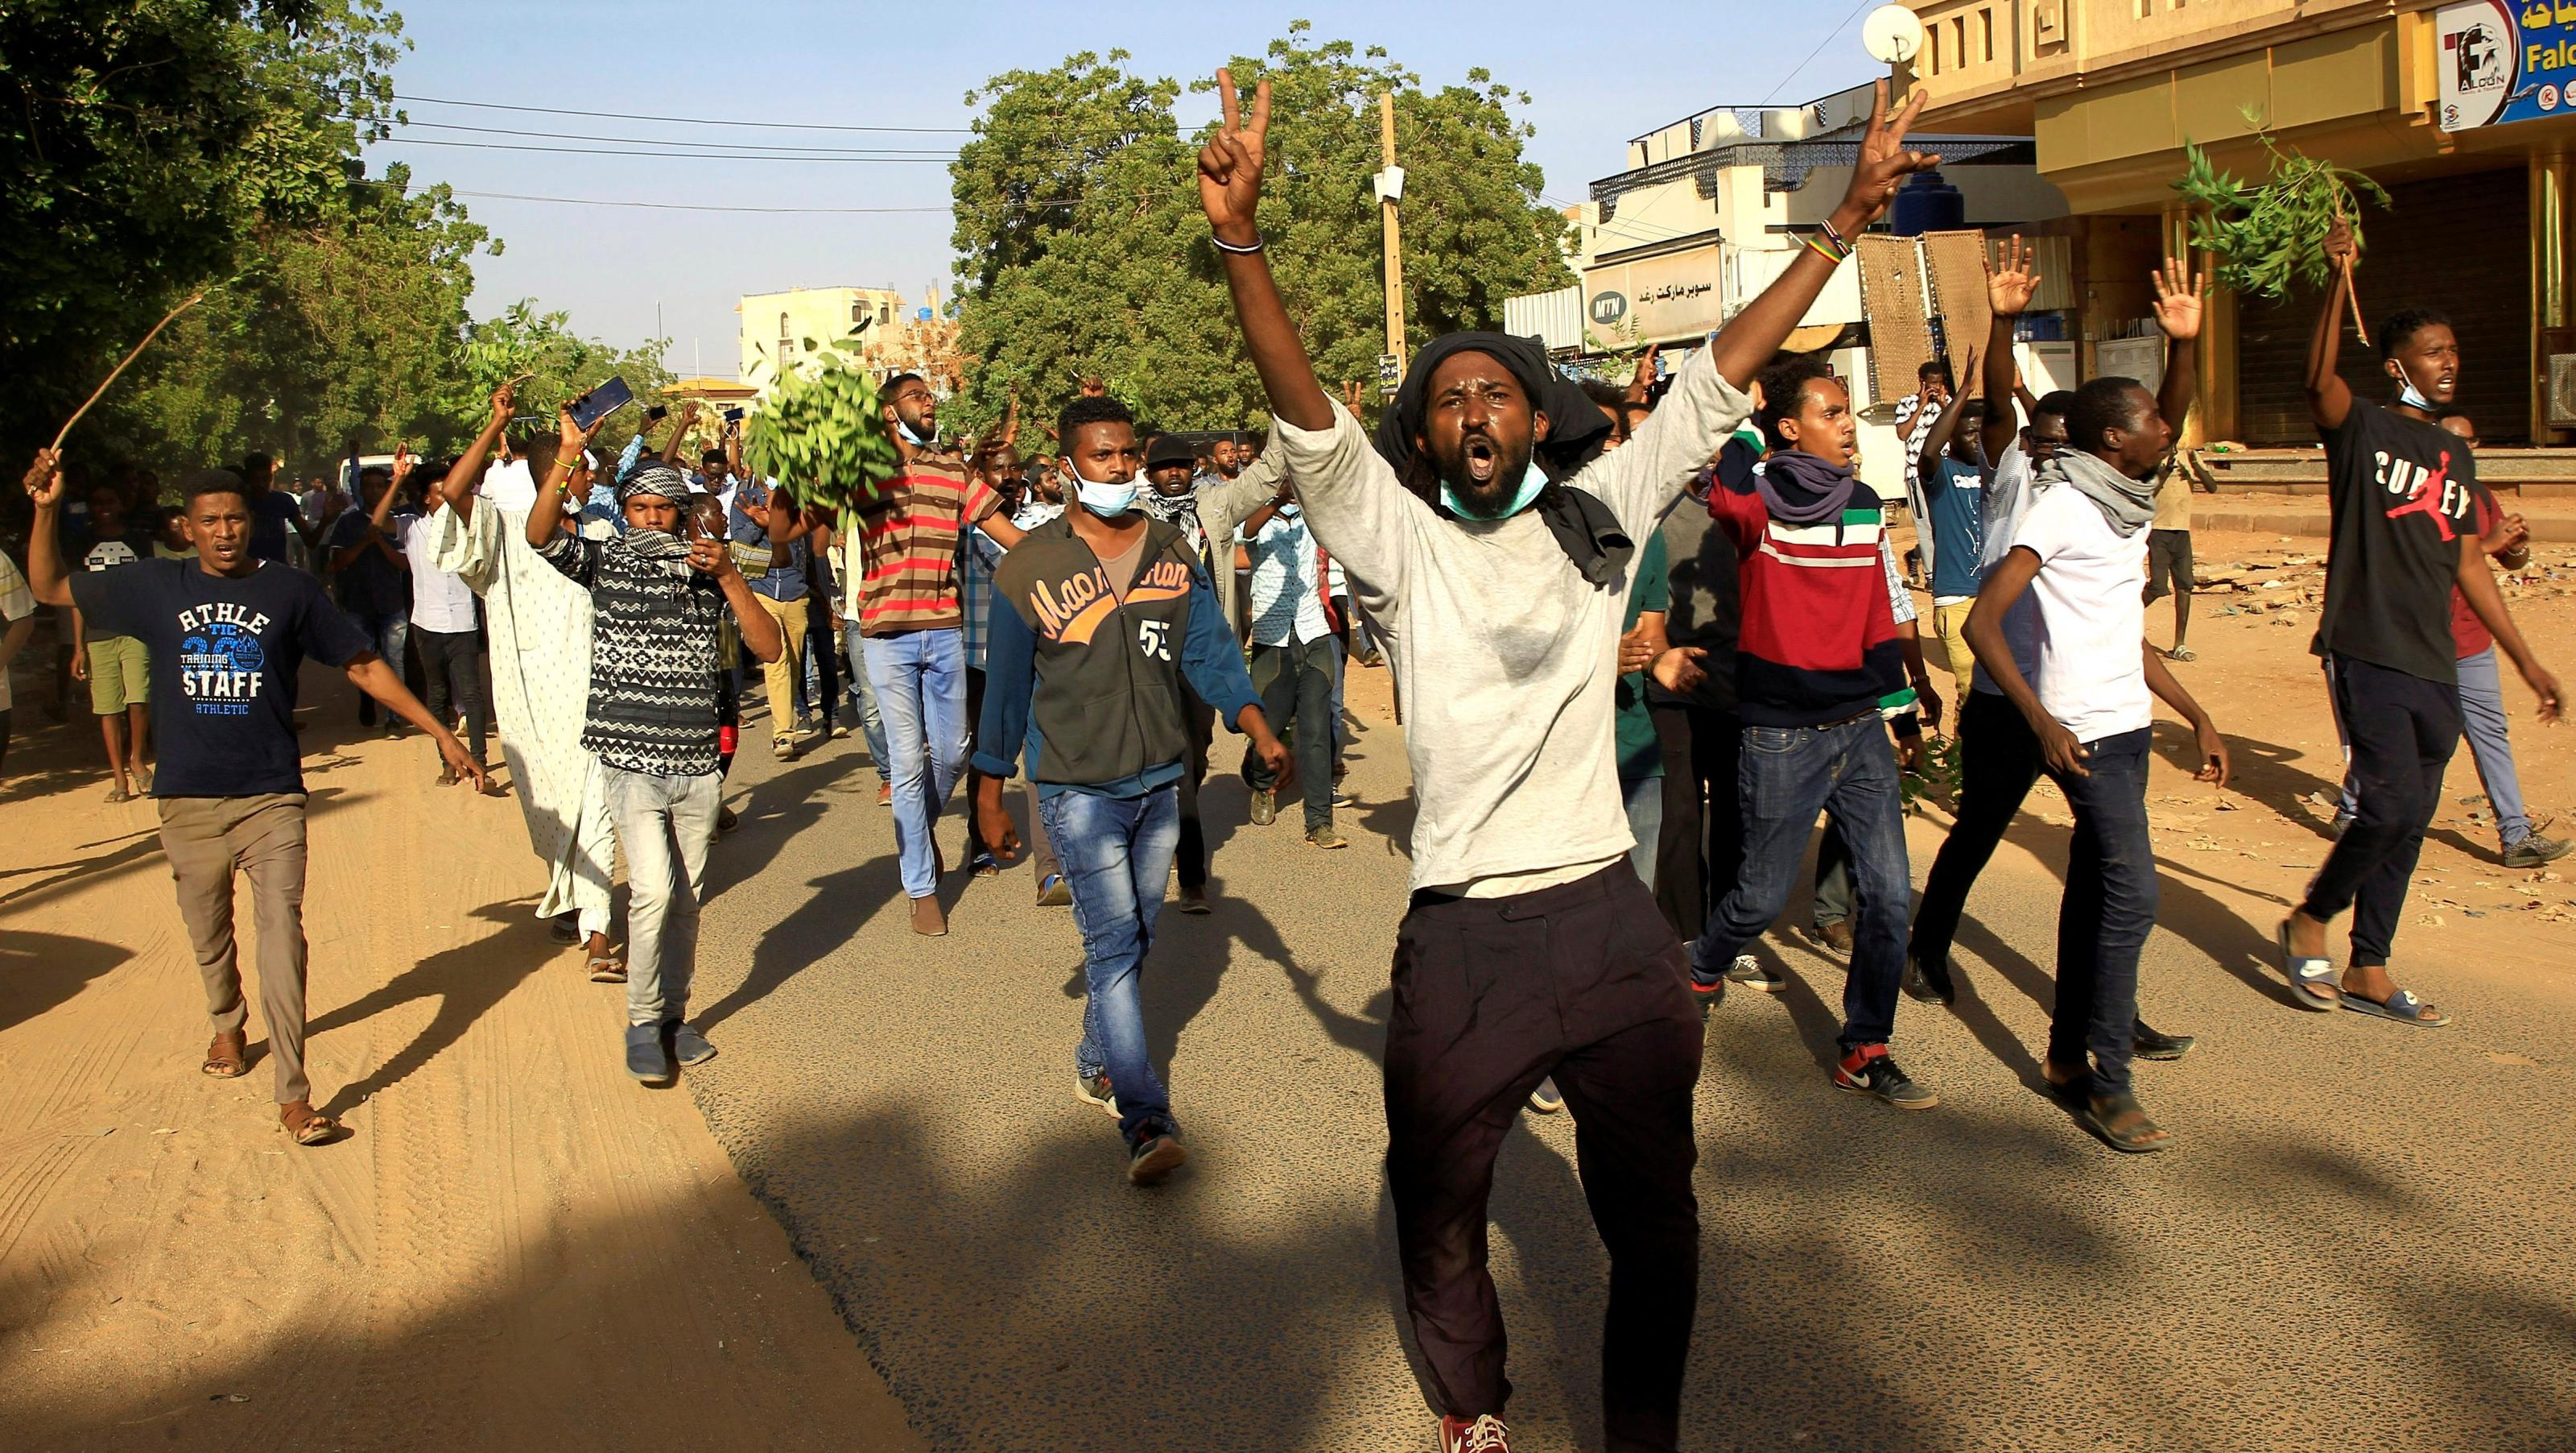 Internet shutdowns in Sudan's uprising cost $1.8 billion